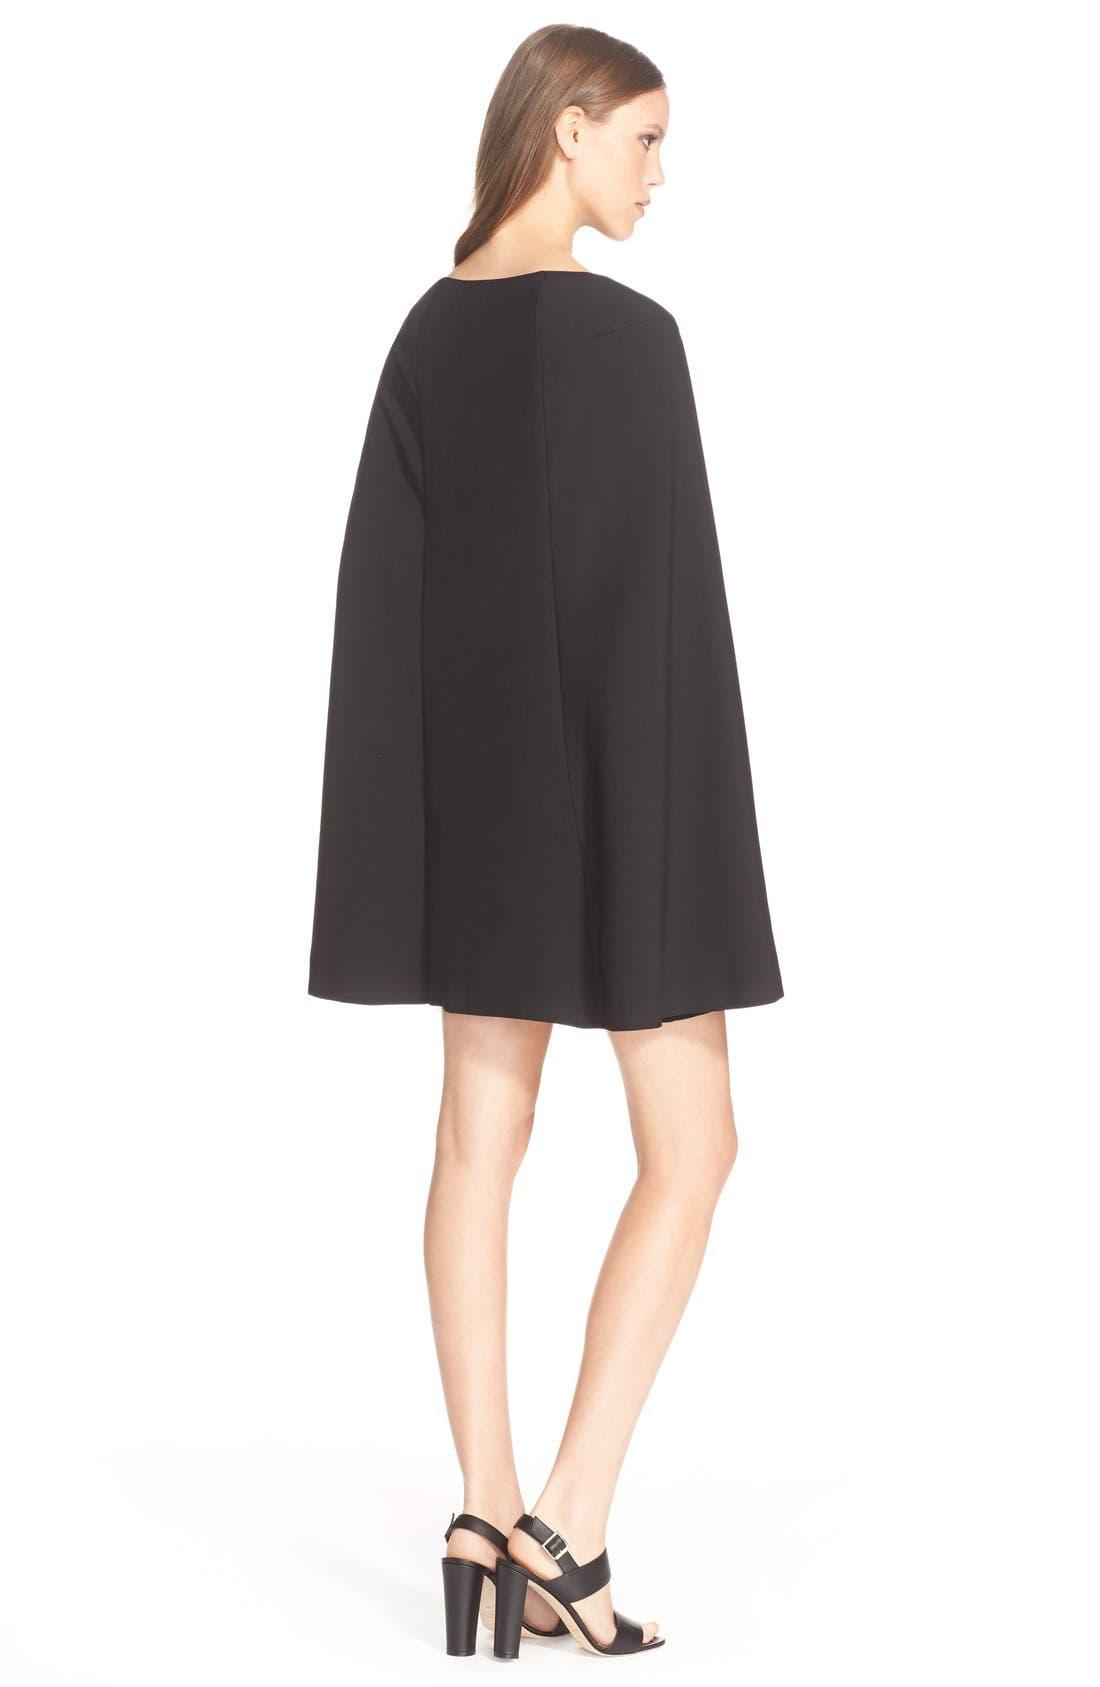 Alternate Image 3  - TrinaTurk'Gizela'Cape Back Dress